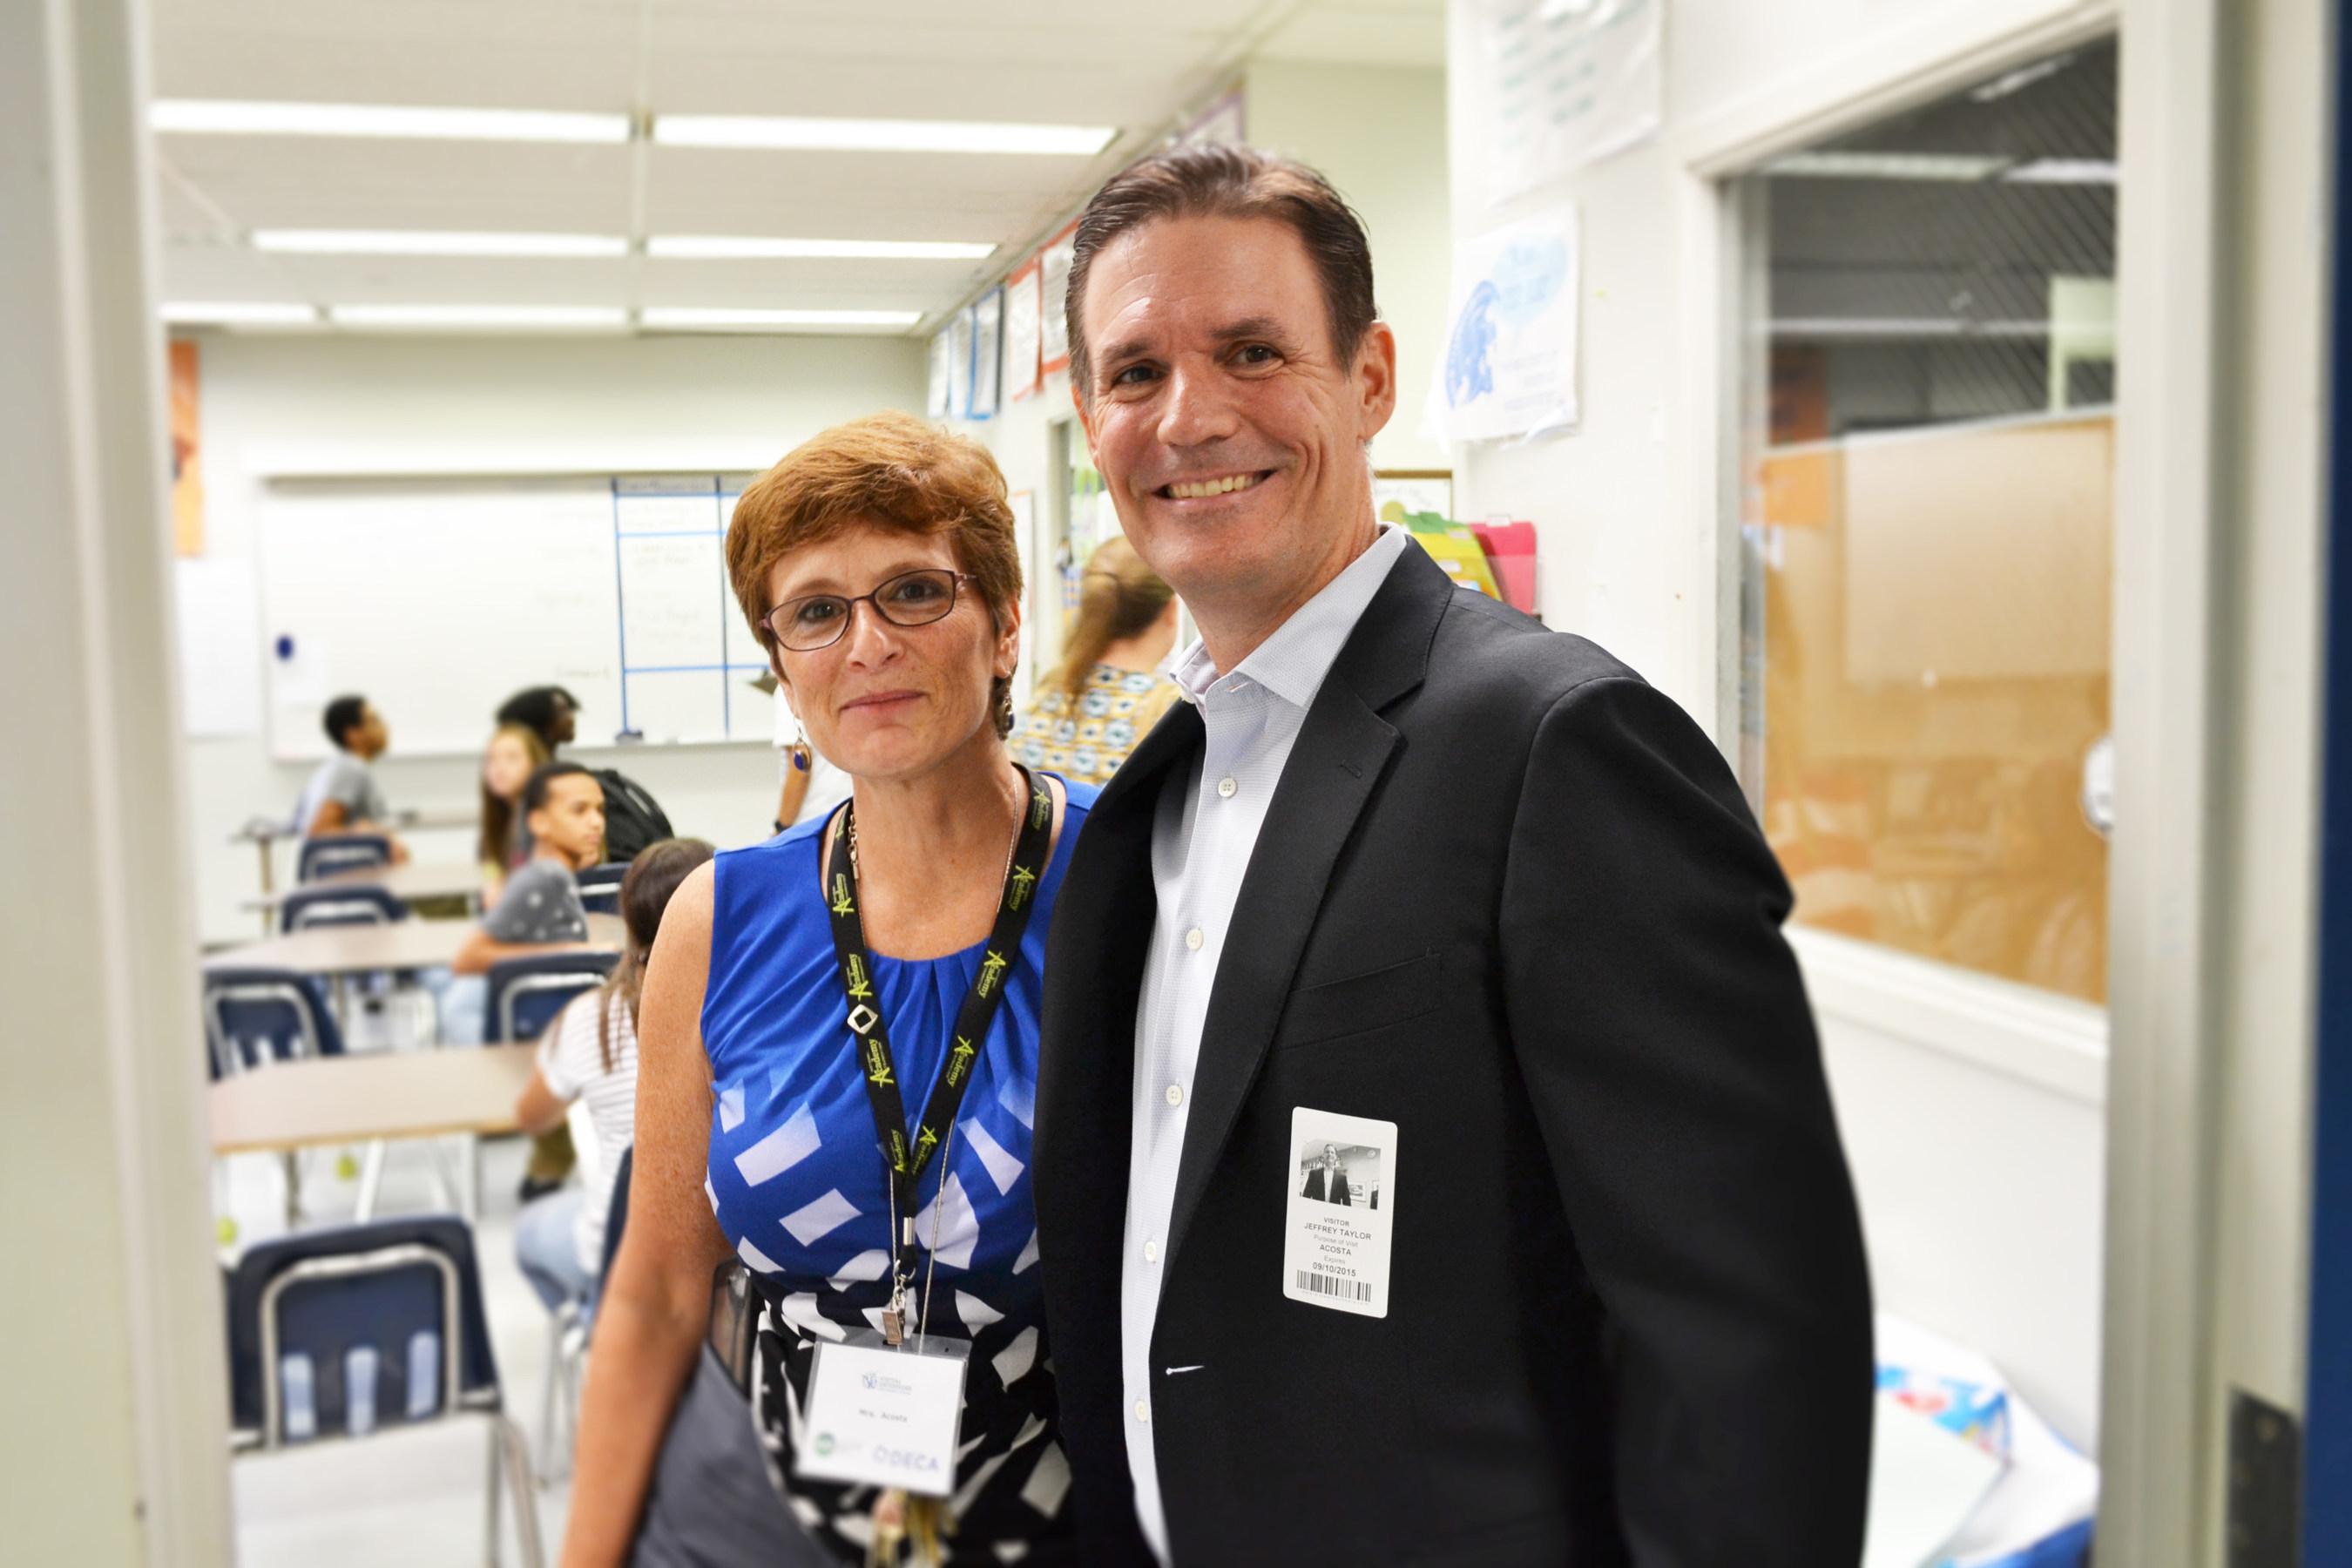 Digital Risk Co-founder & Managing Partner Jeff Taylor and J.P. Taravella High School Teacher Laurie Acosta, on-site coordinator of the school's VEI program.